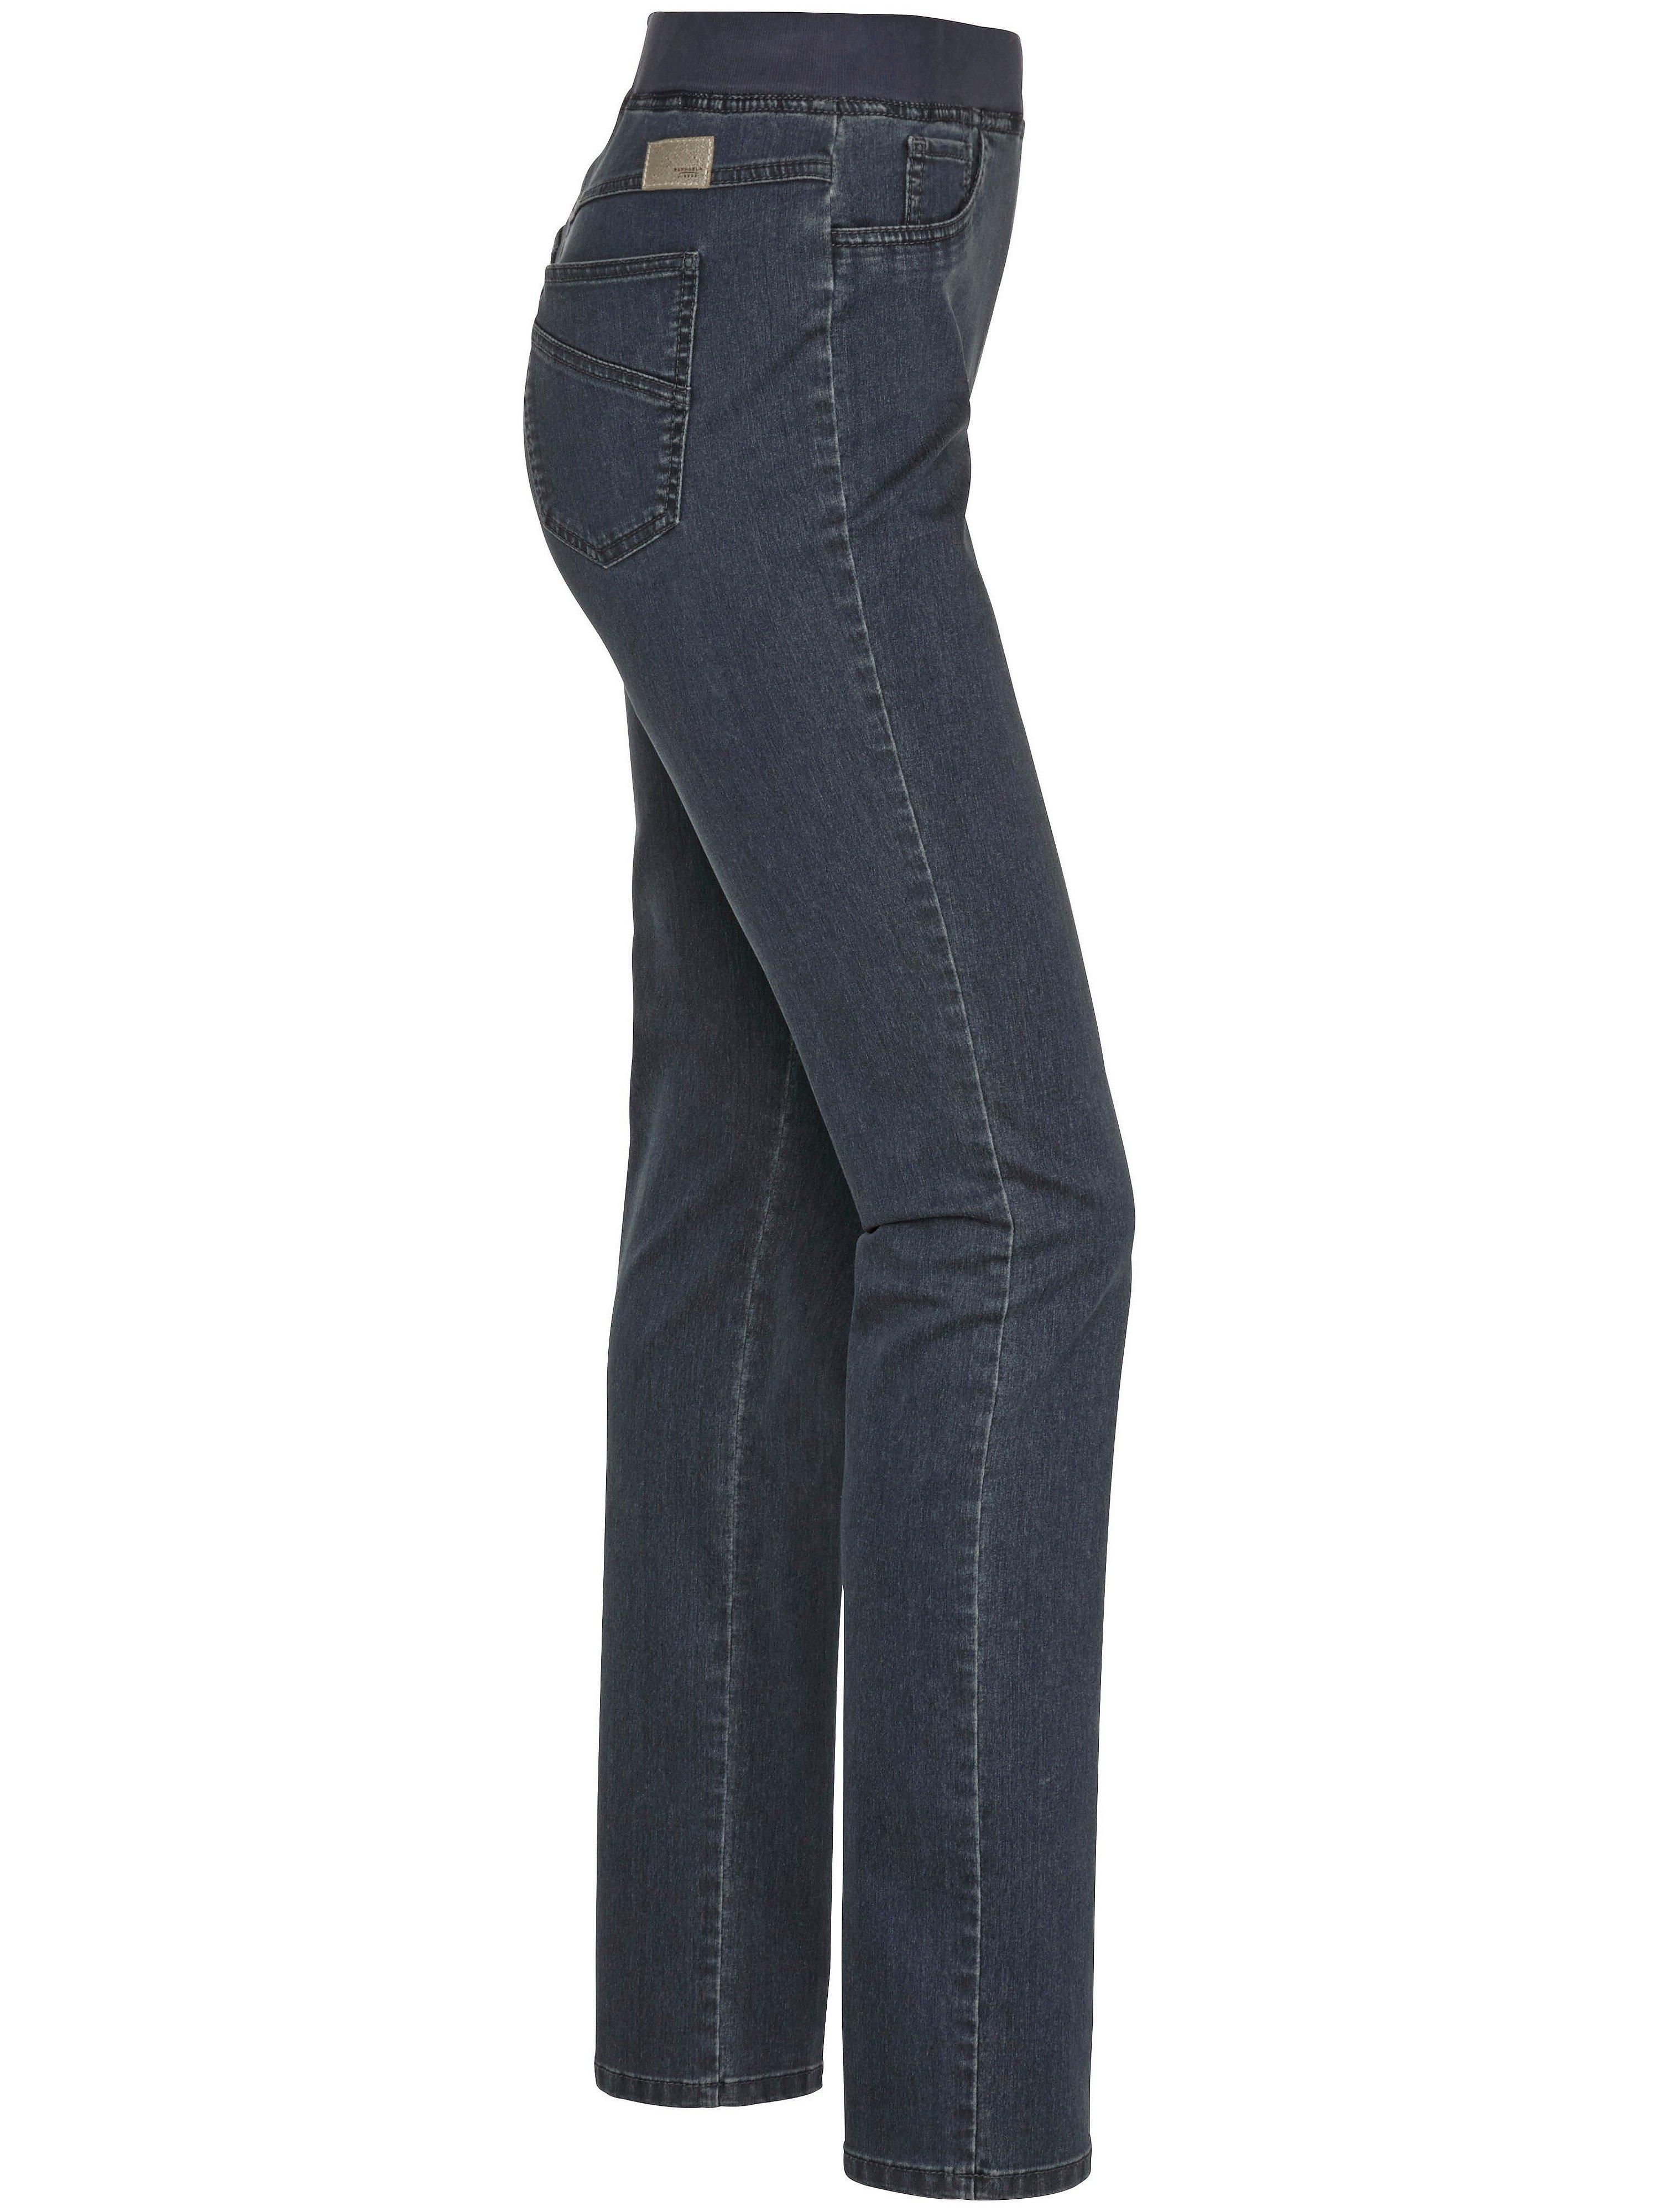 Comfort Plus-jeans model Carina Fra Raphaela by Brax denim